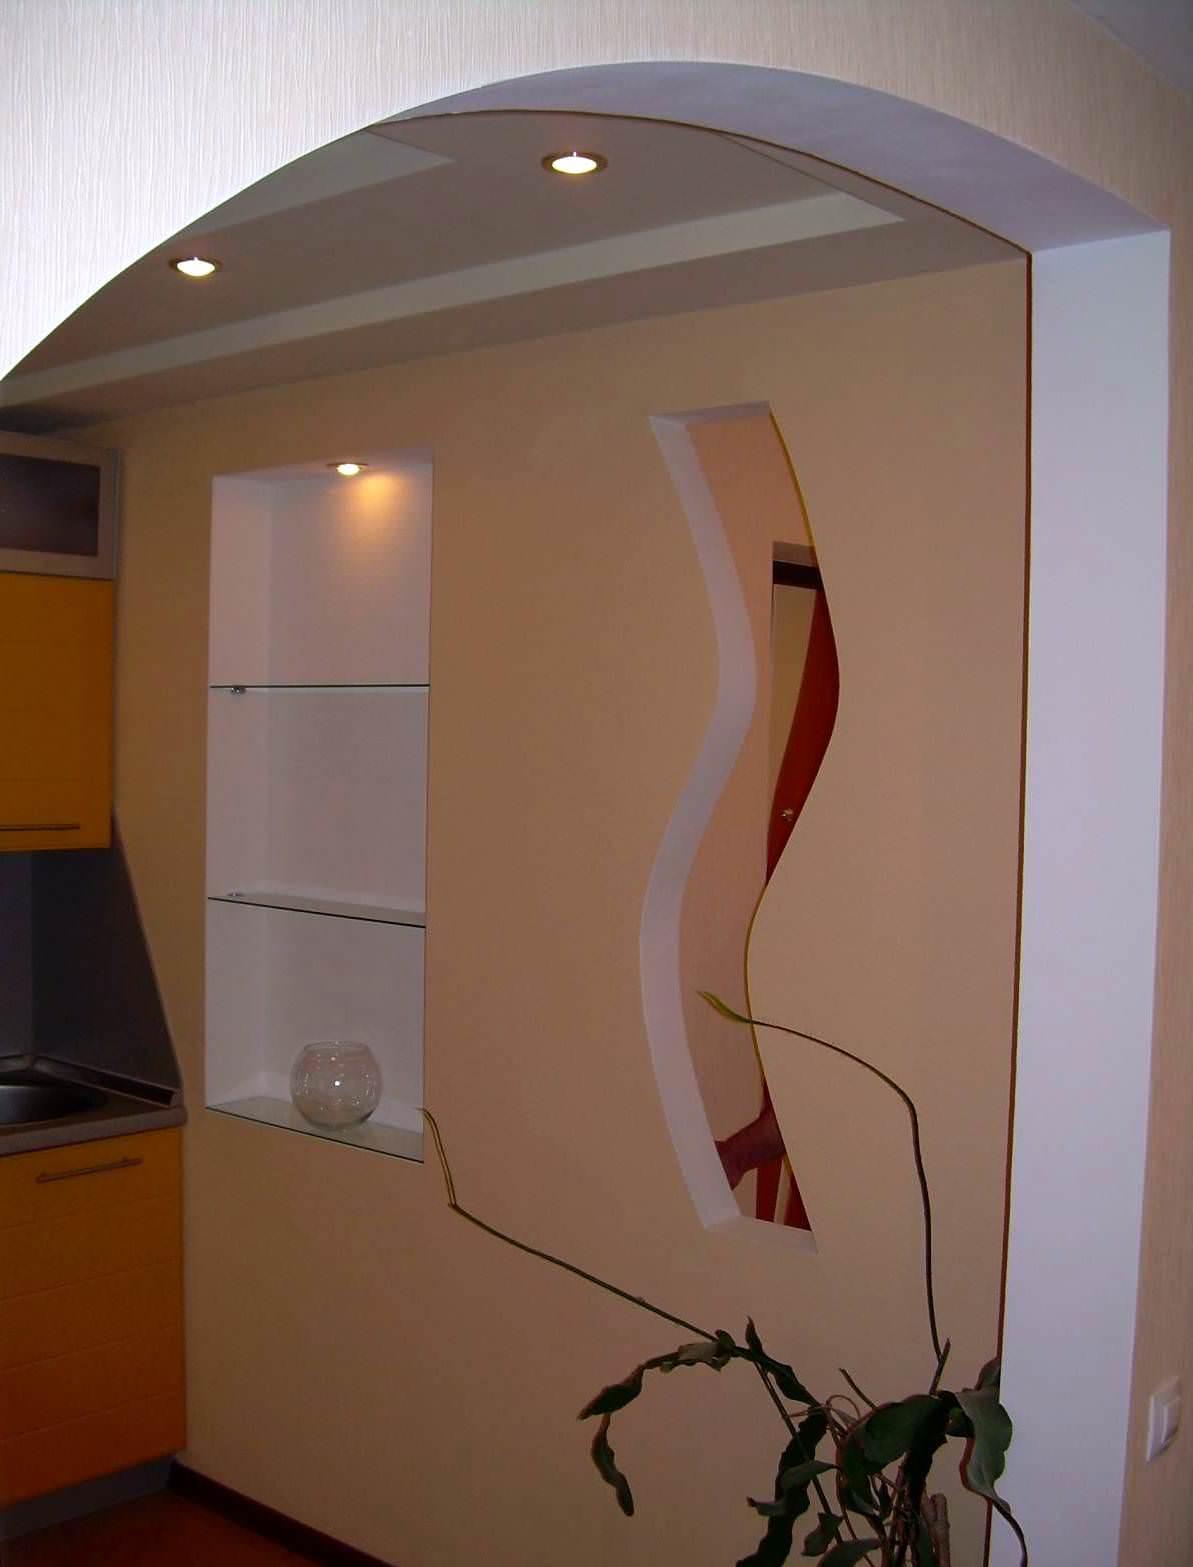 арки из гипсокартона фото дизайн для кухни центр круга